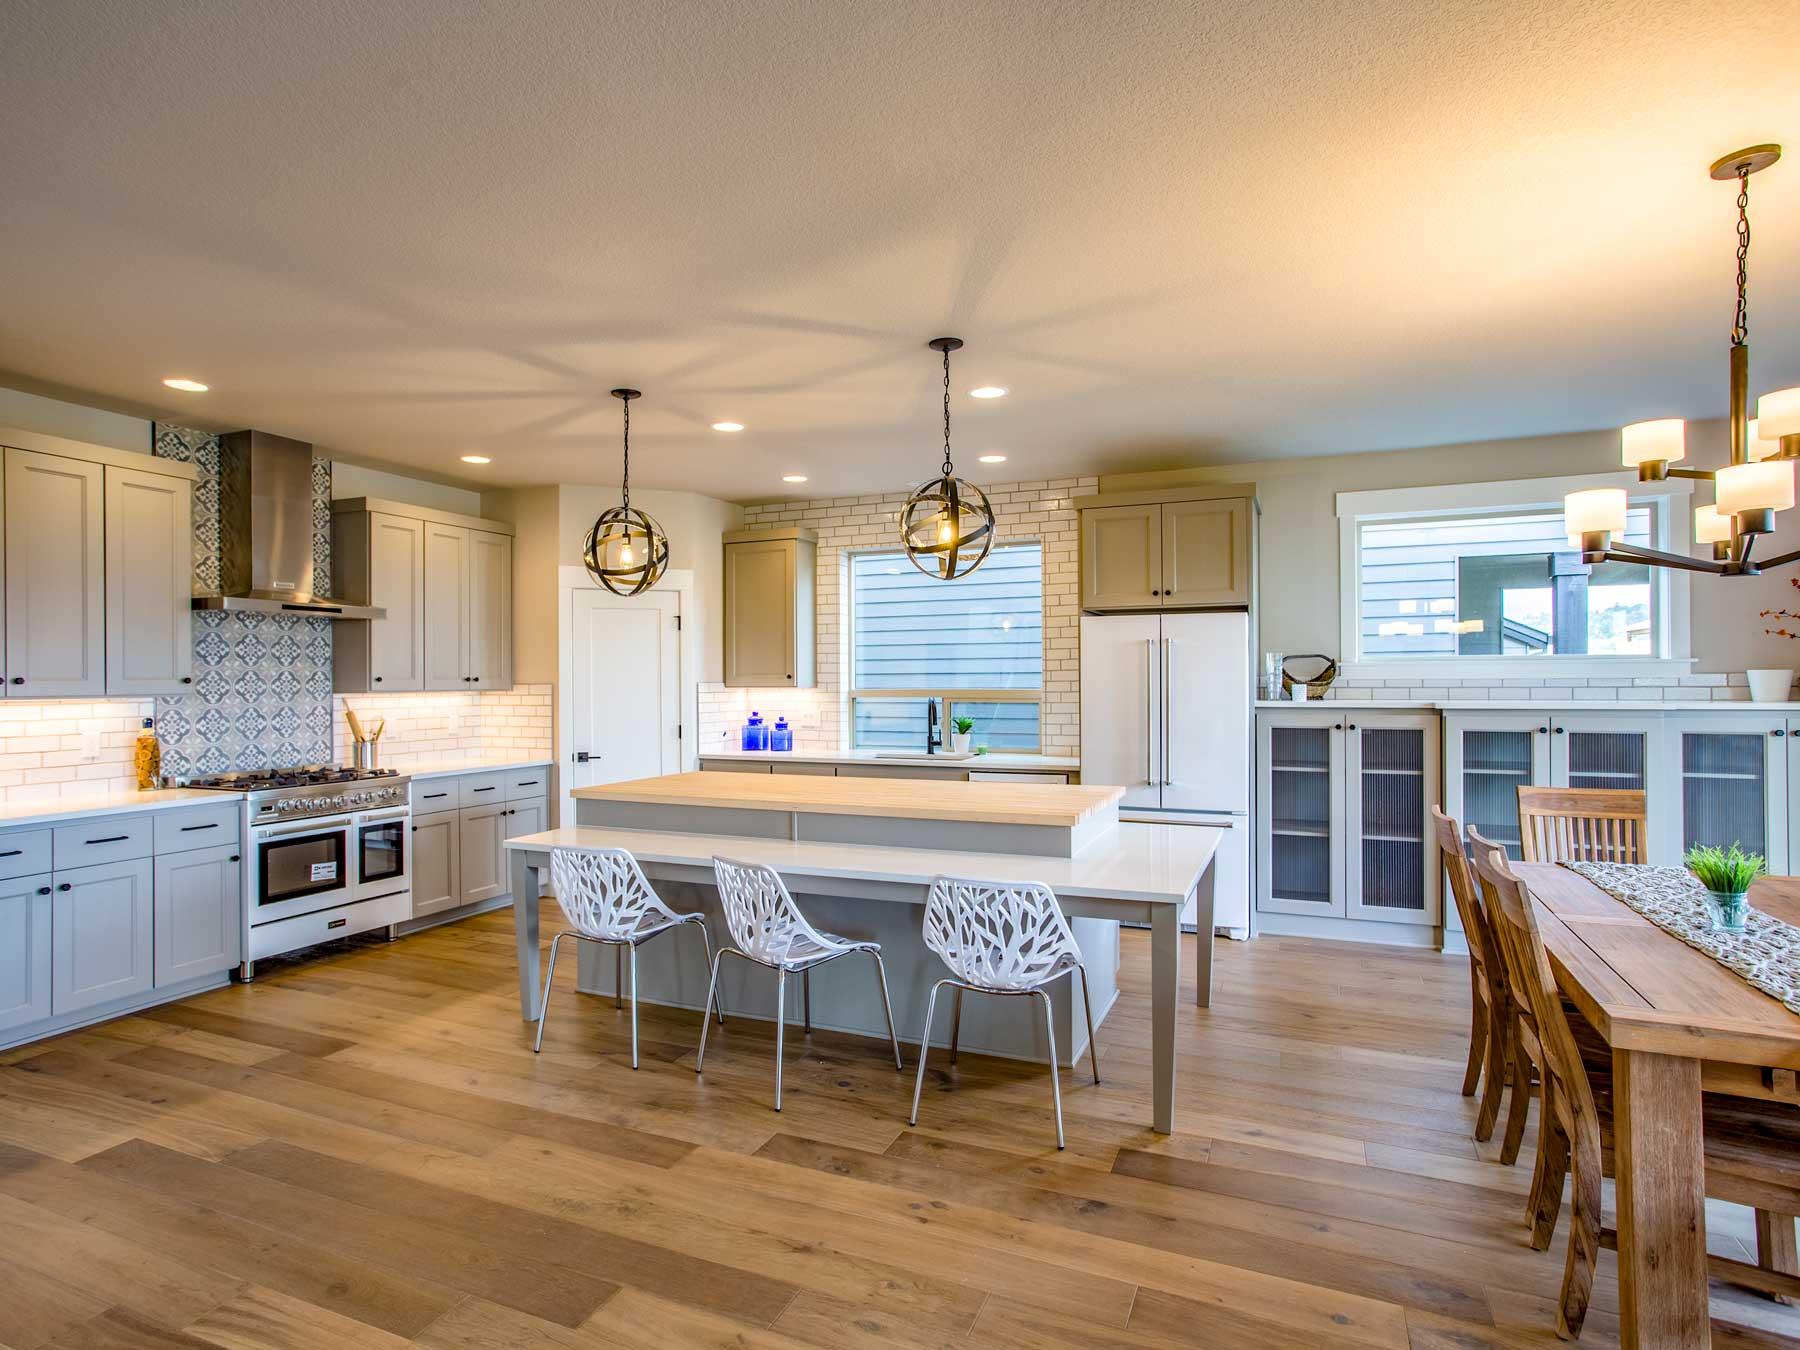 Beaverton Kitchen - Nova Casework